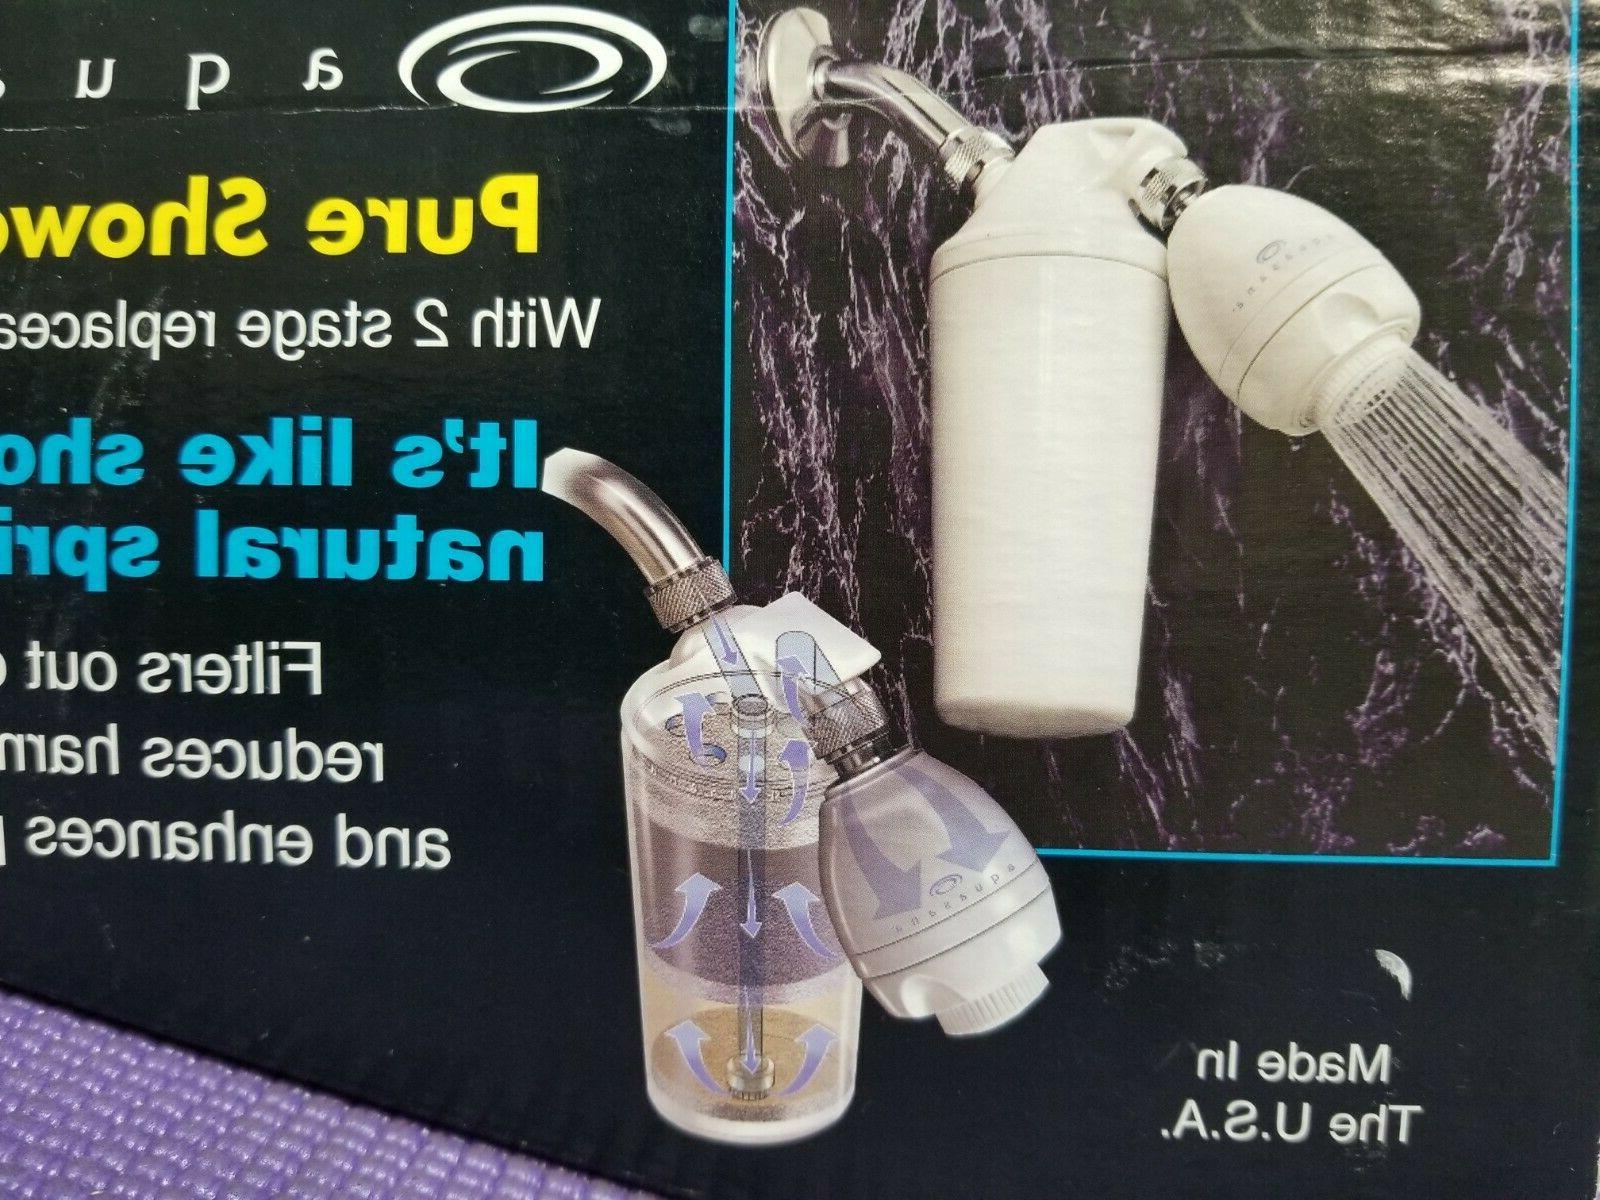 Aquasana AQ-4100 Shower Filter System